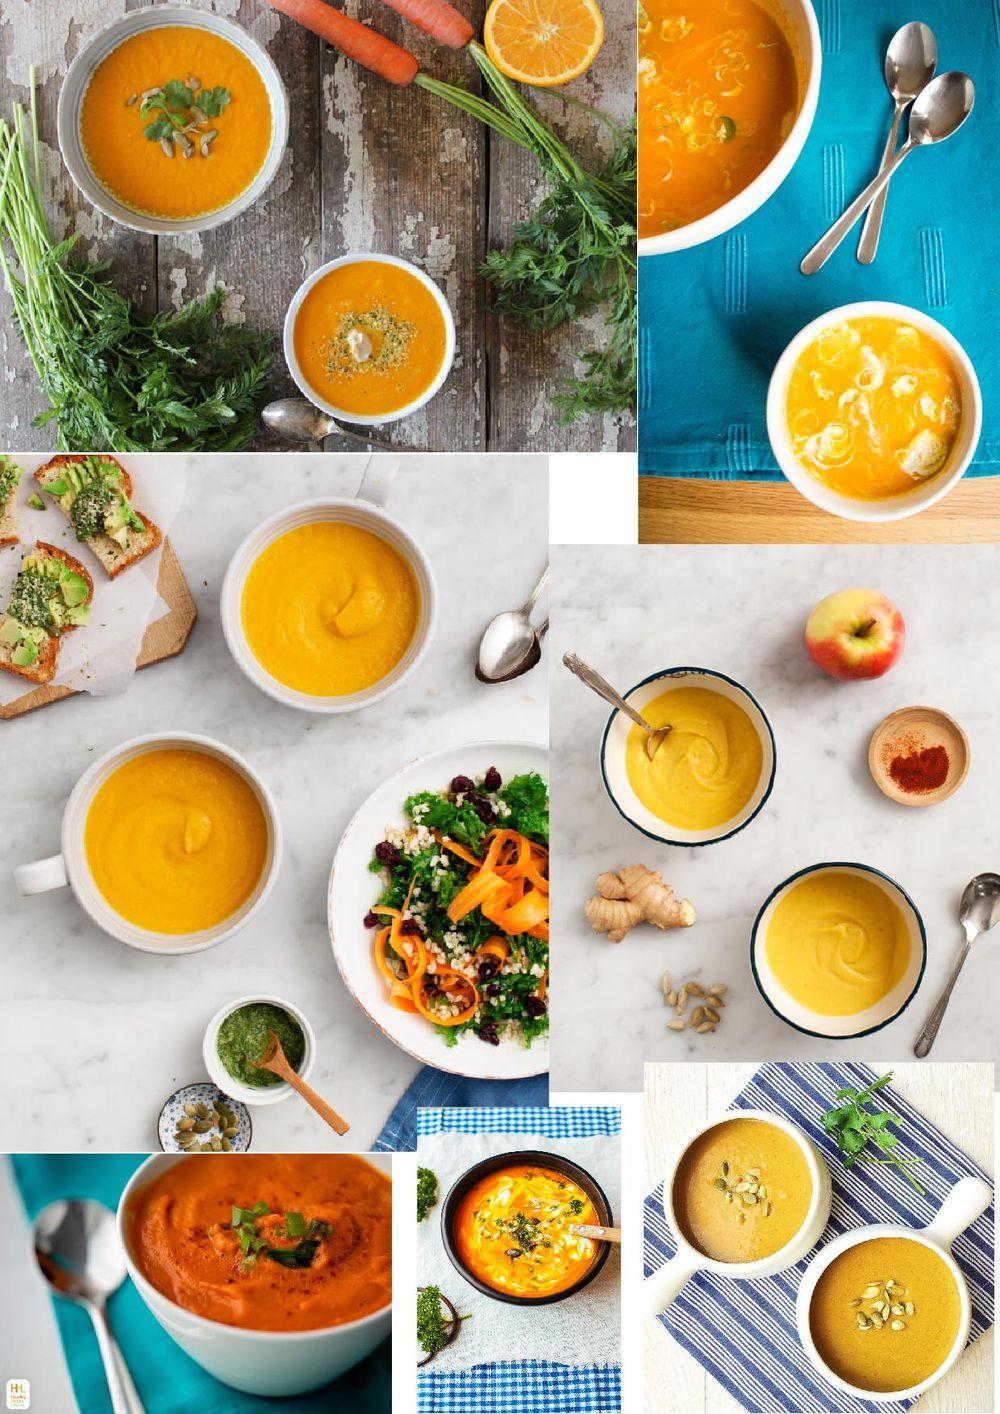 Veloute Pumpkin Soup - image 2 - student project